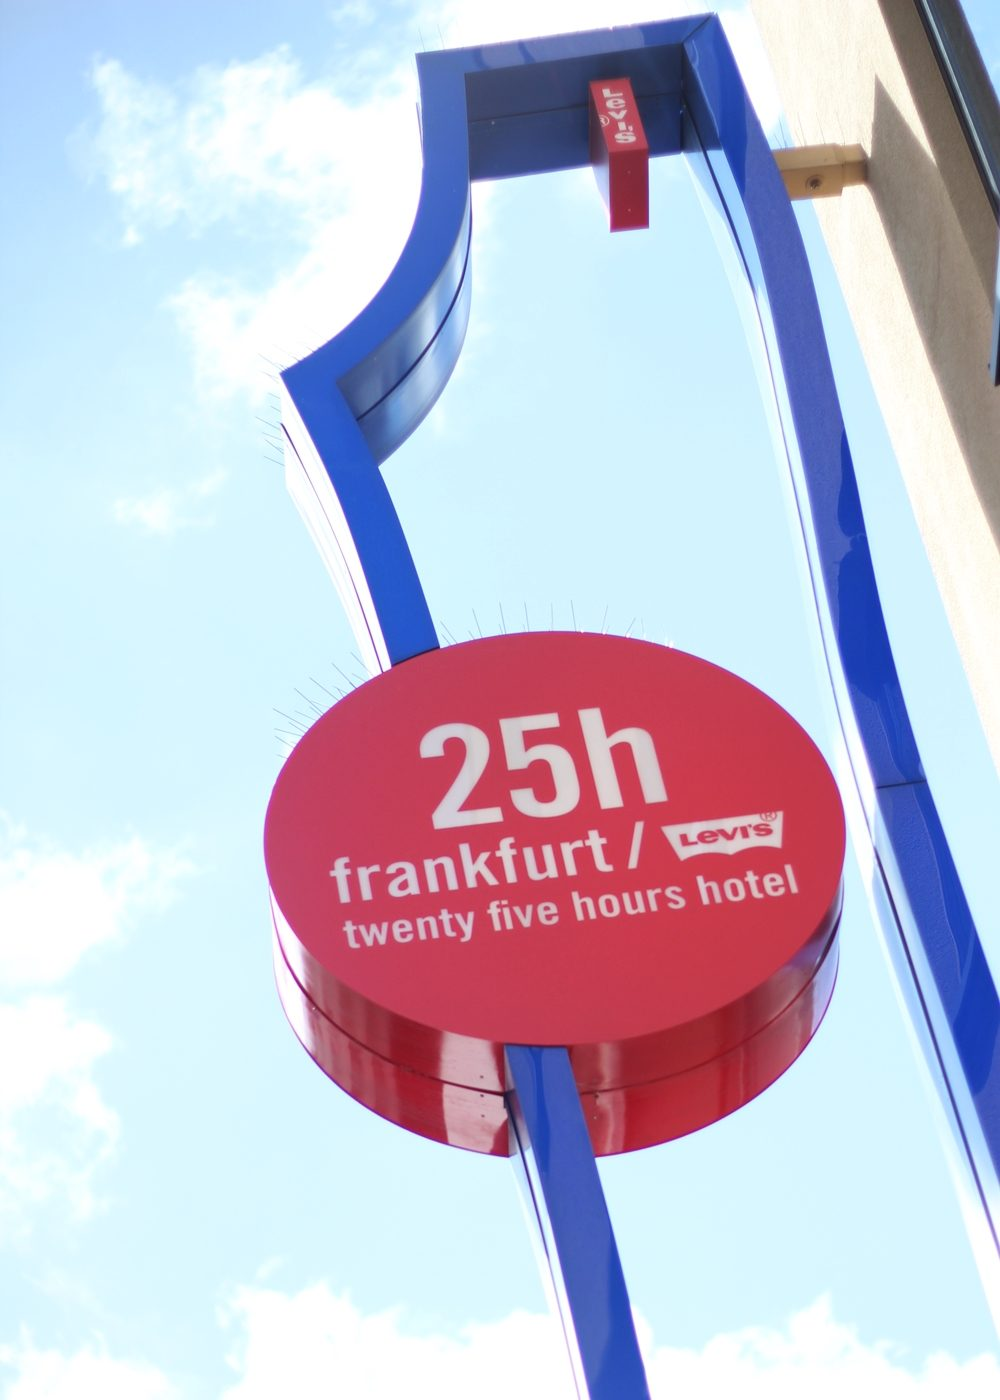 Backyard Party 25 Hours Hotel Levis Frankfurt (9)